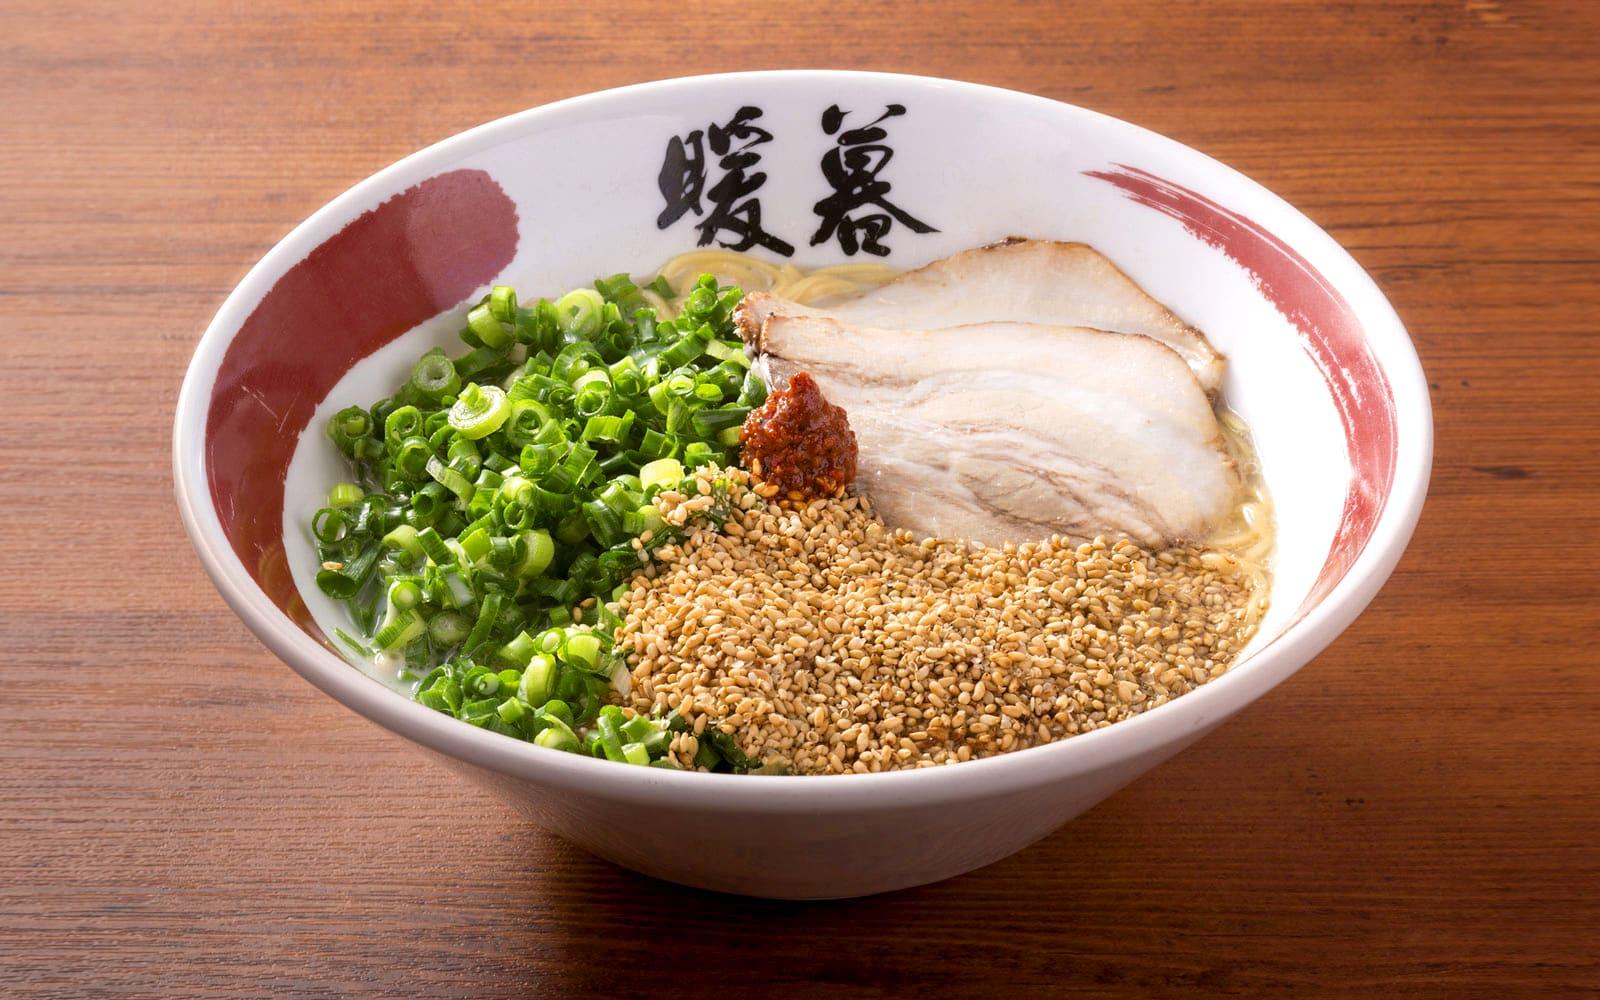 圖片取自http://danbo.jp